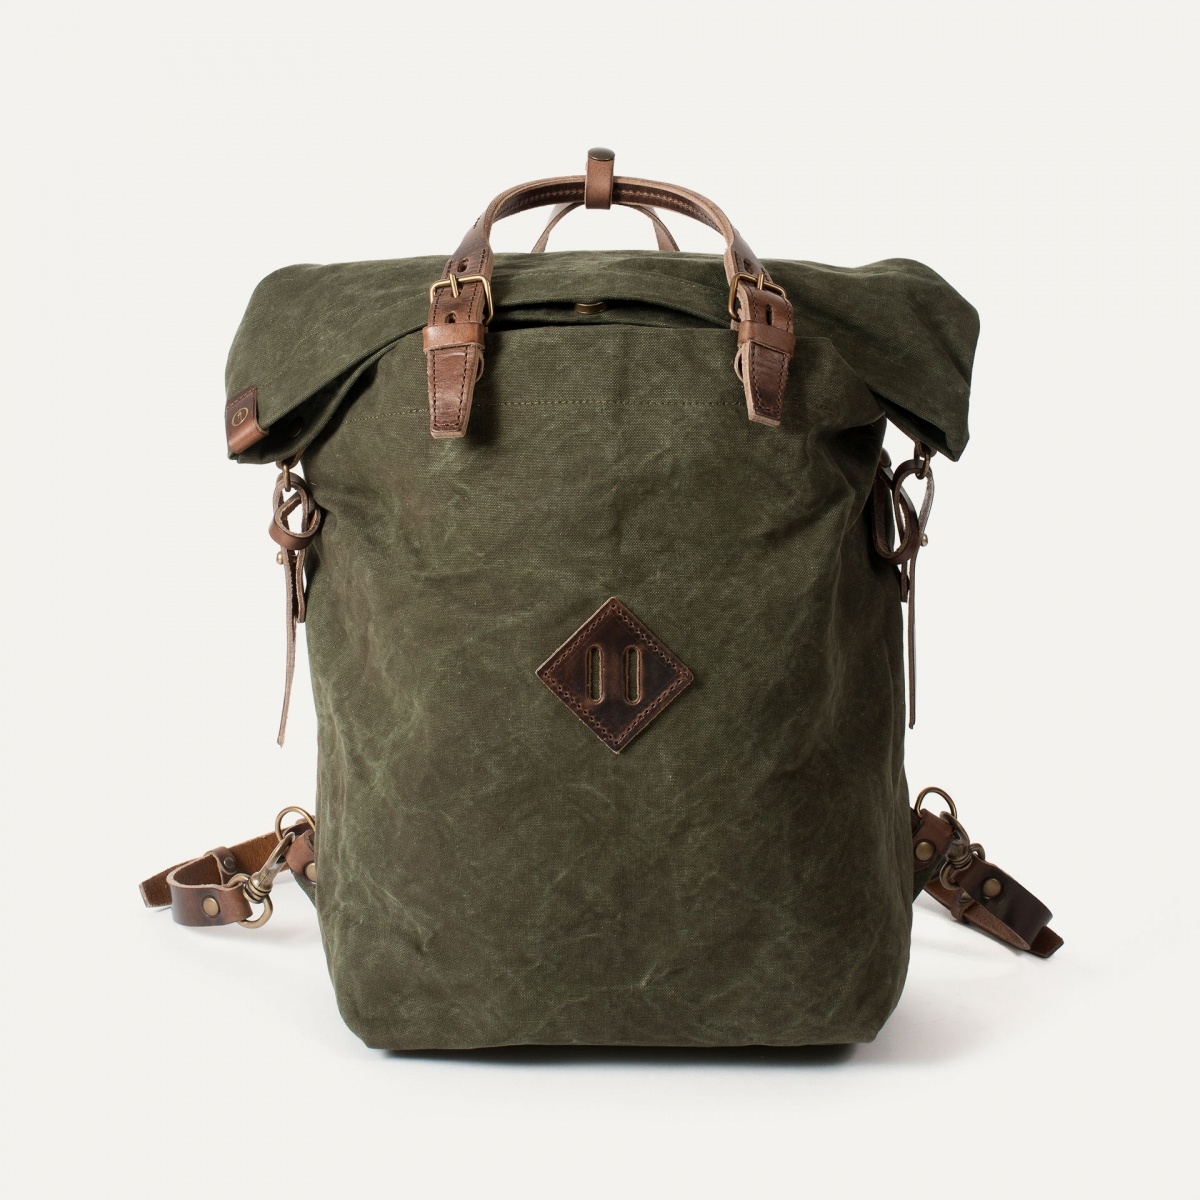 Woody M Backpack - Dark Khaki (image n°1)